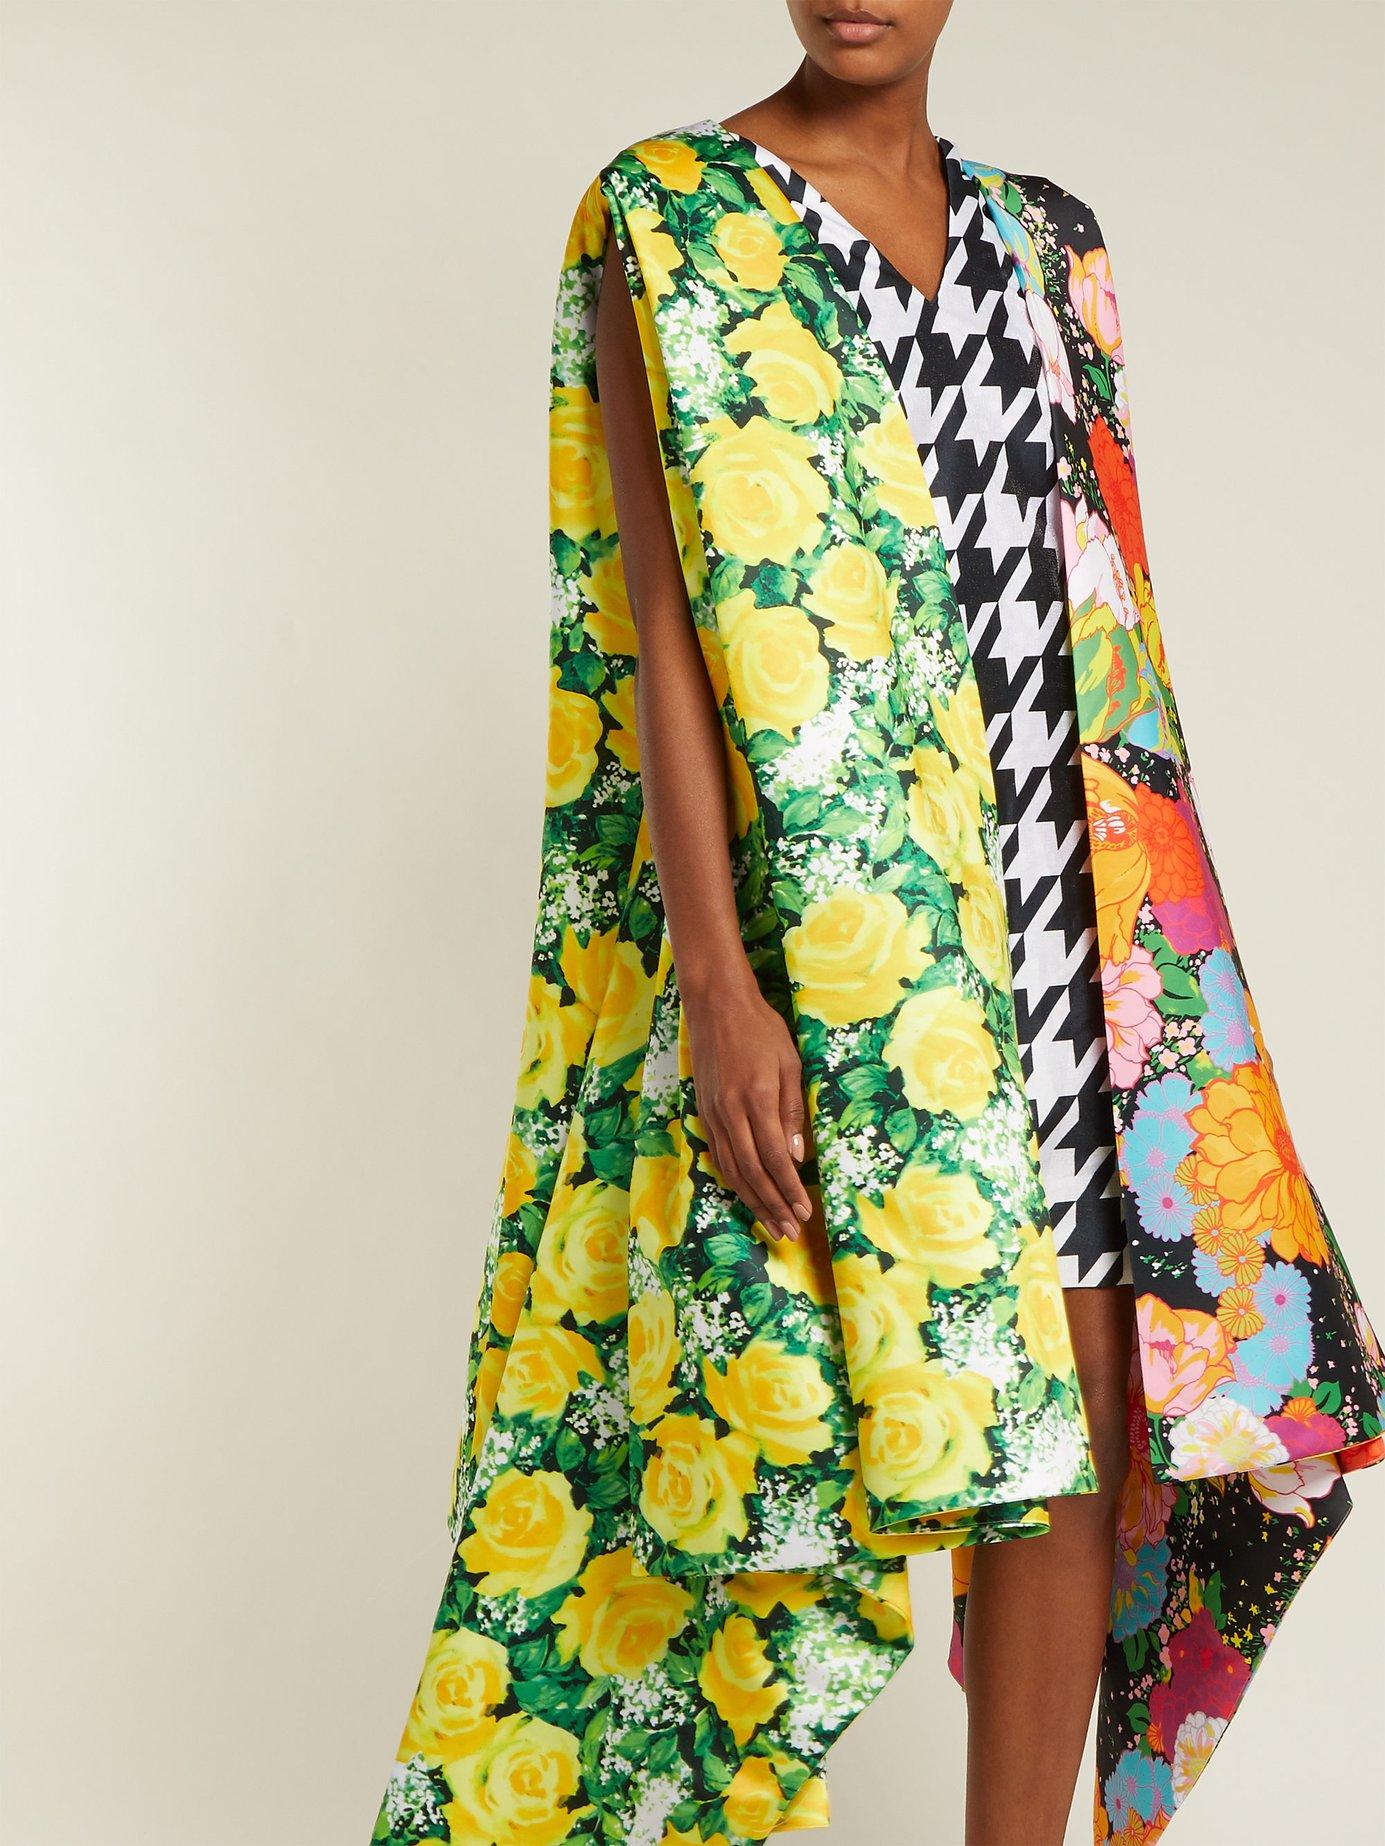 Contrasting print satin cape-dress by Richard Quinn